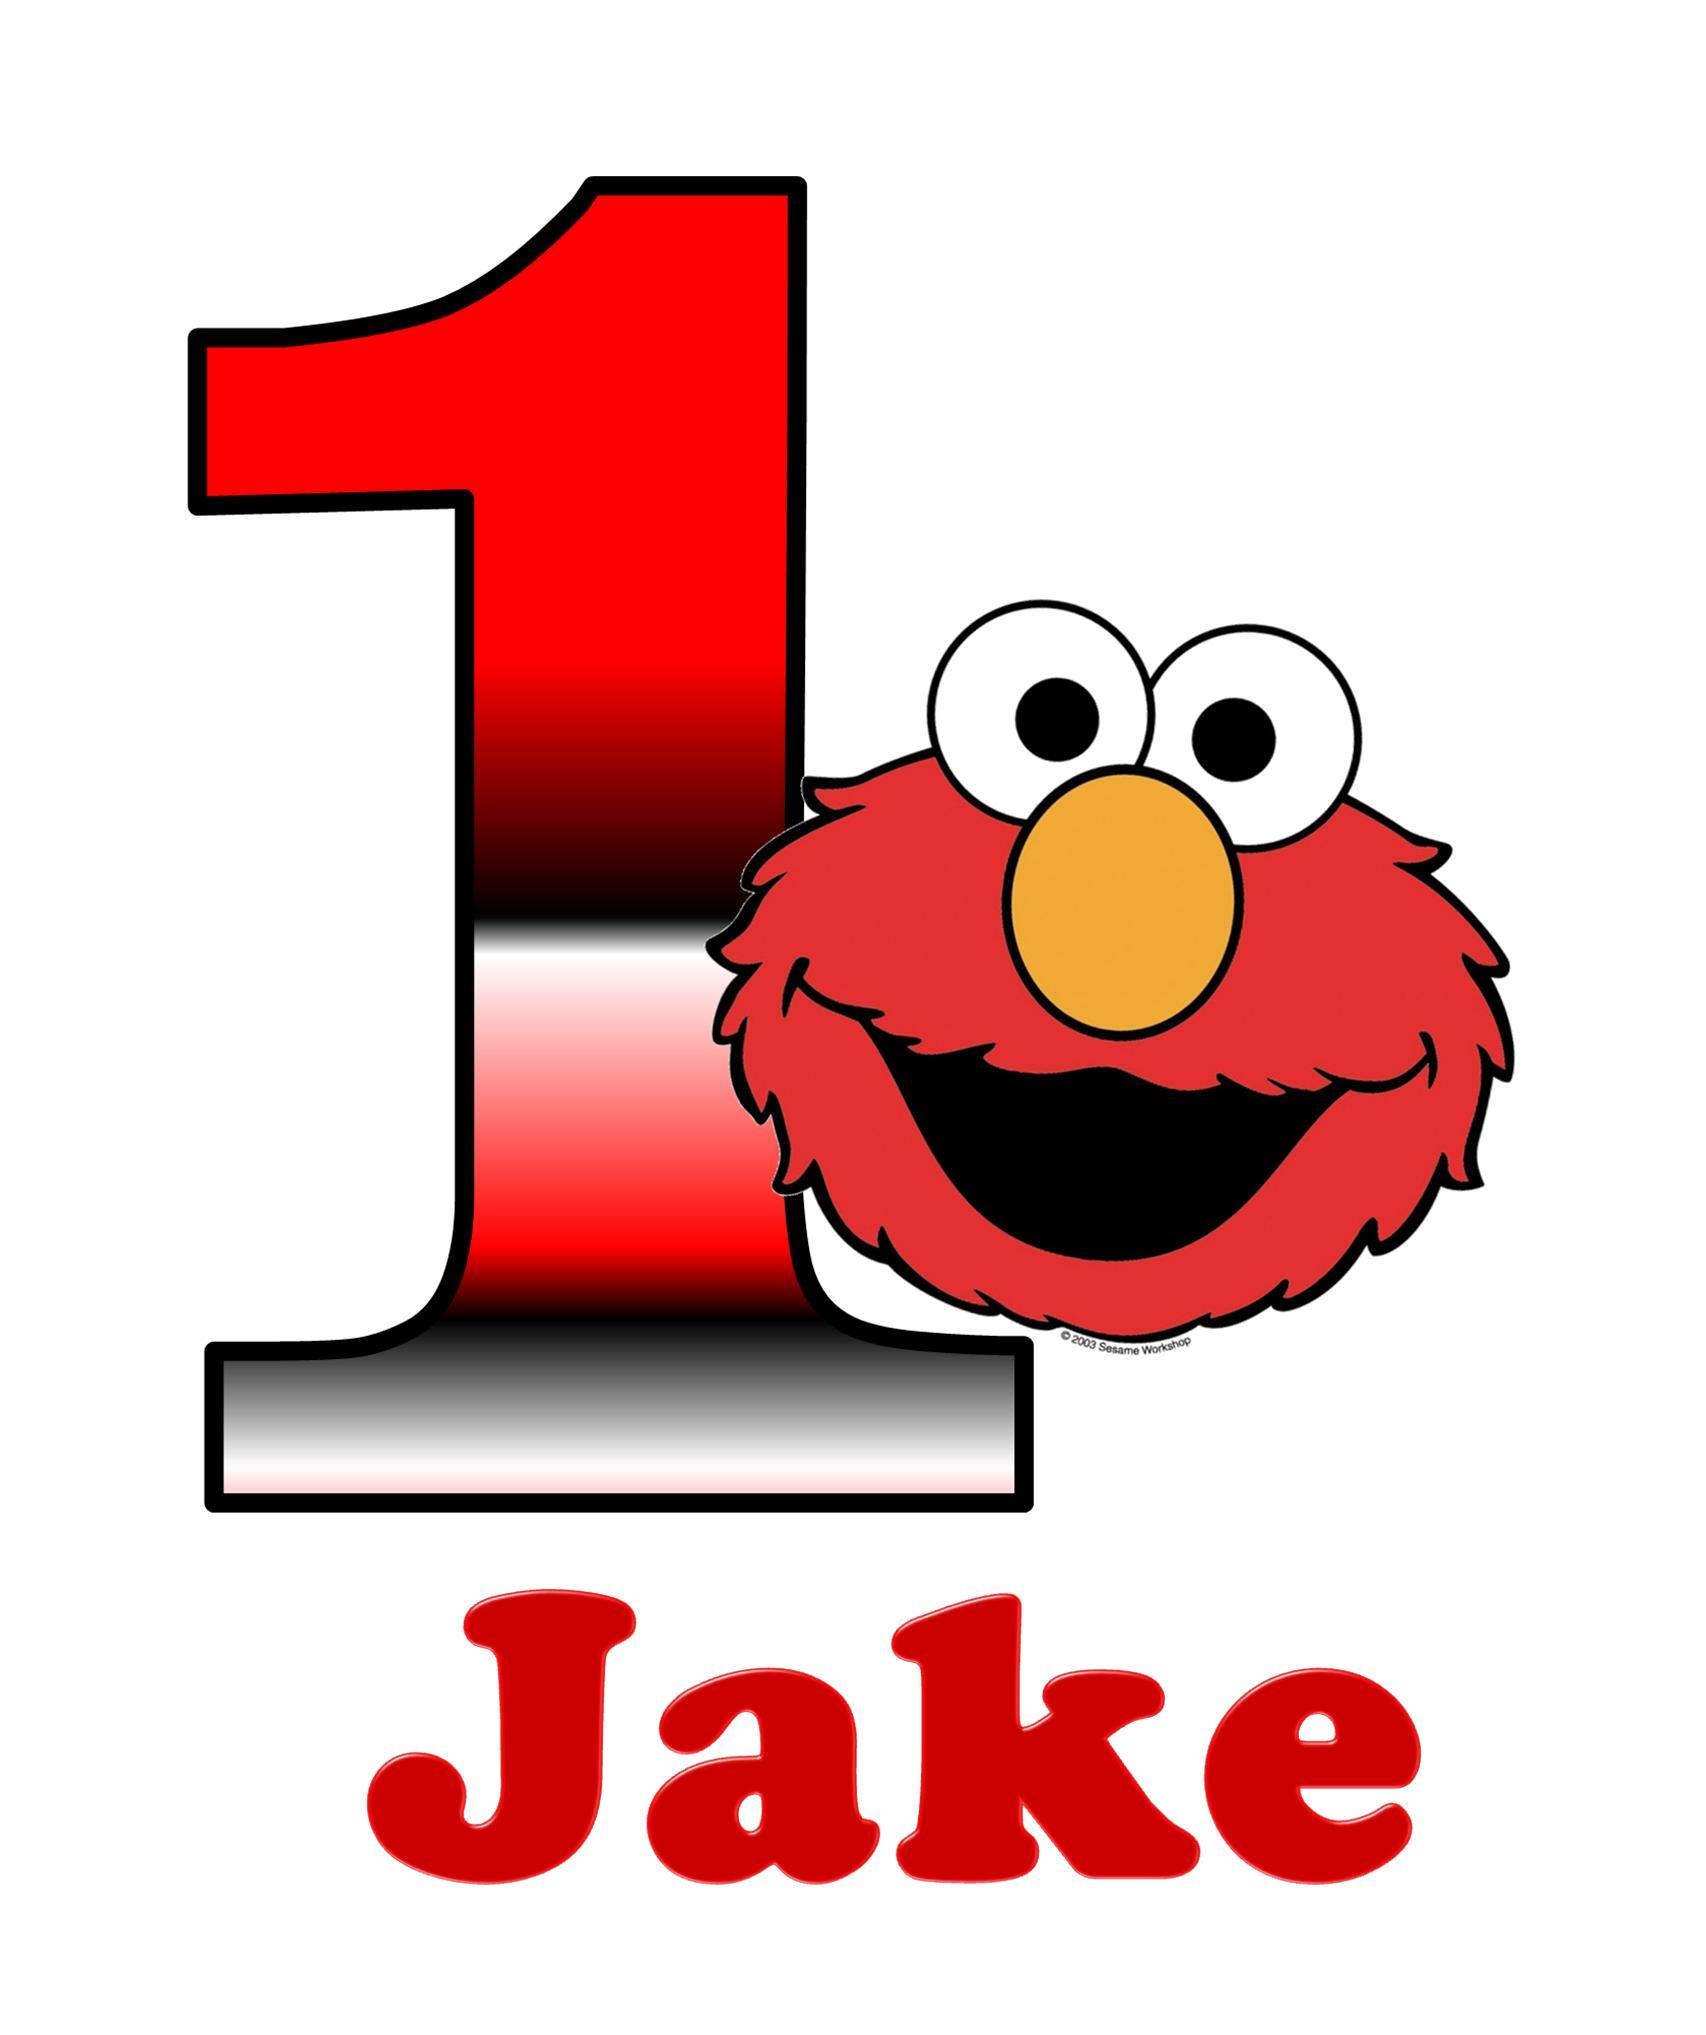 1706x2035 Elmo Sesame Street Clip Art Free